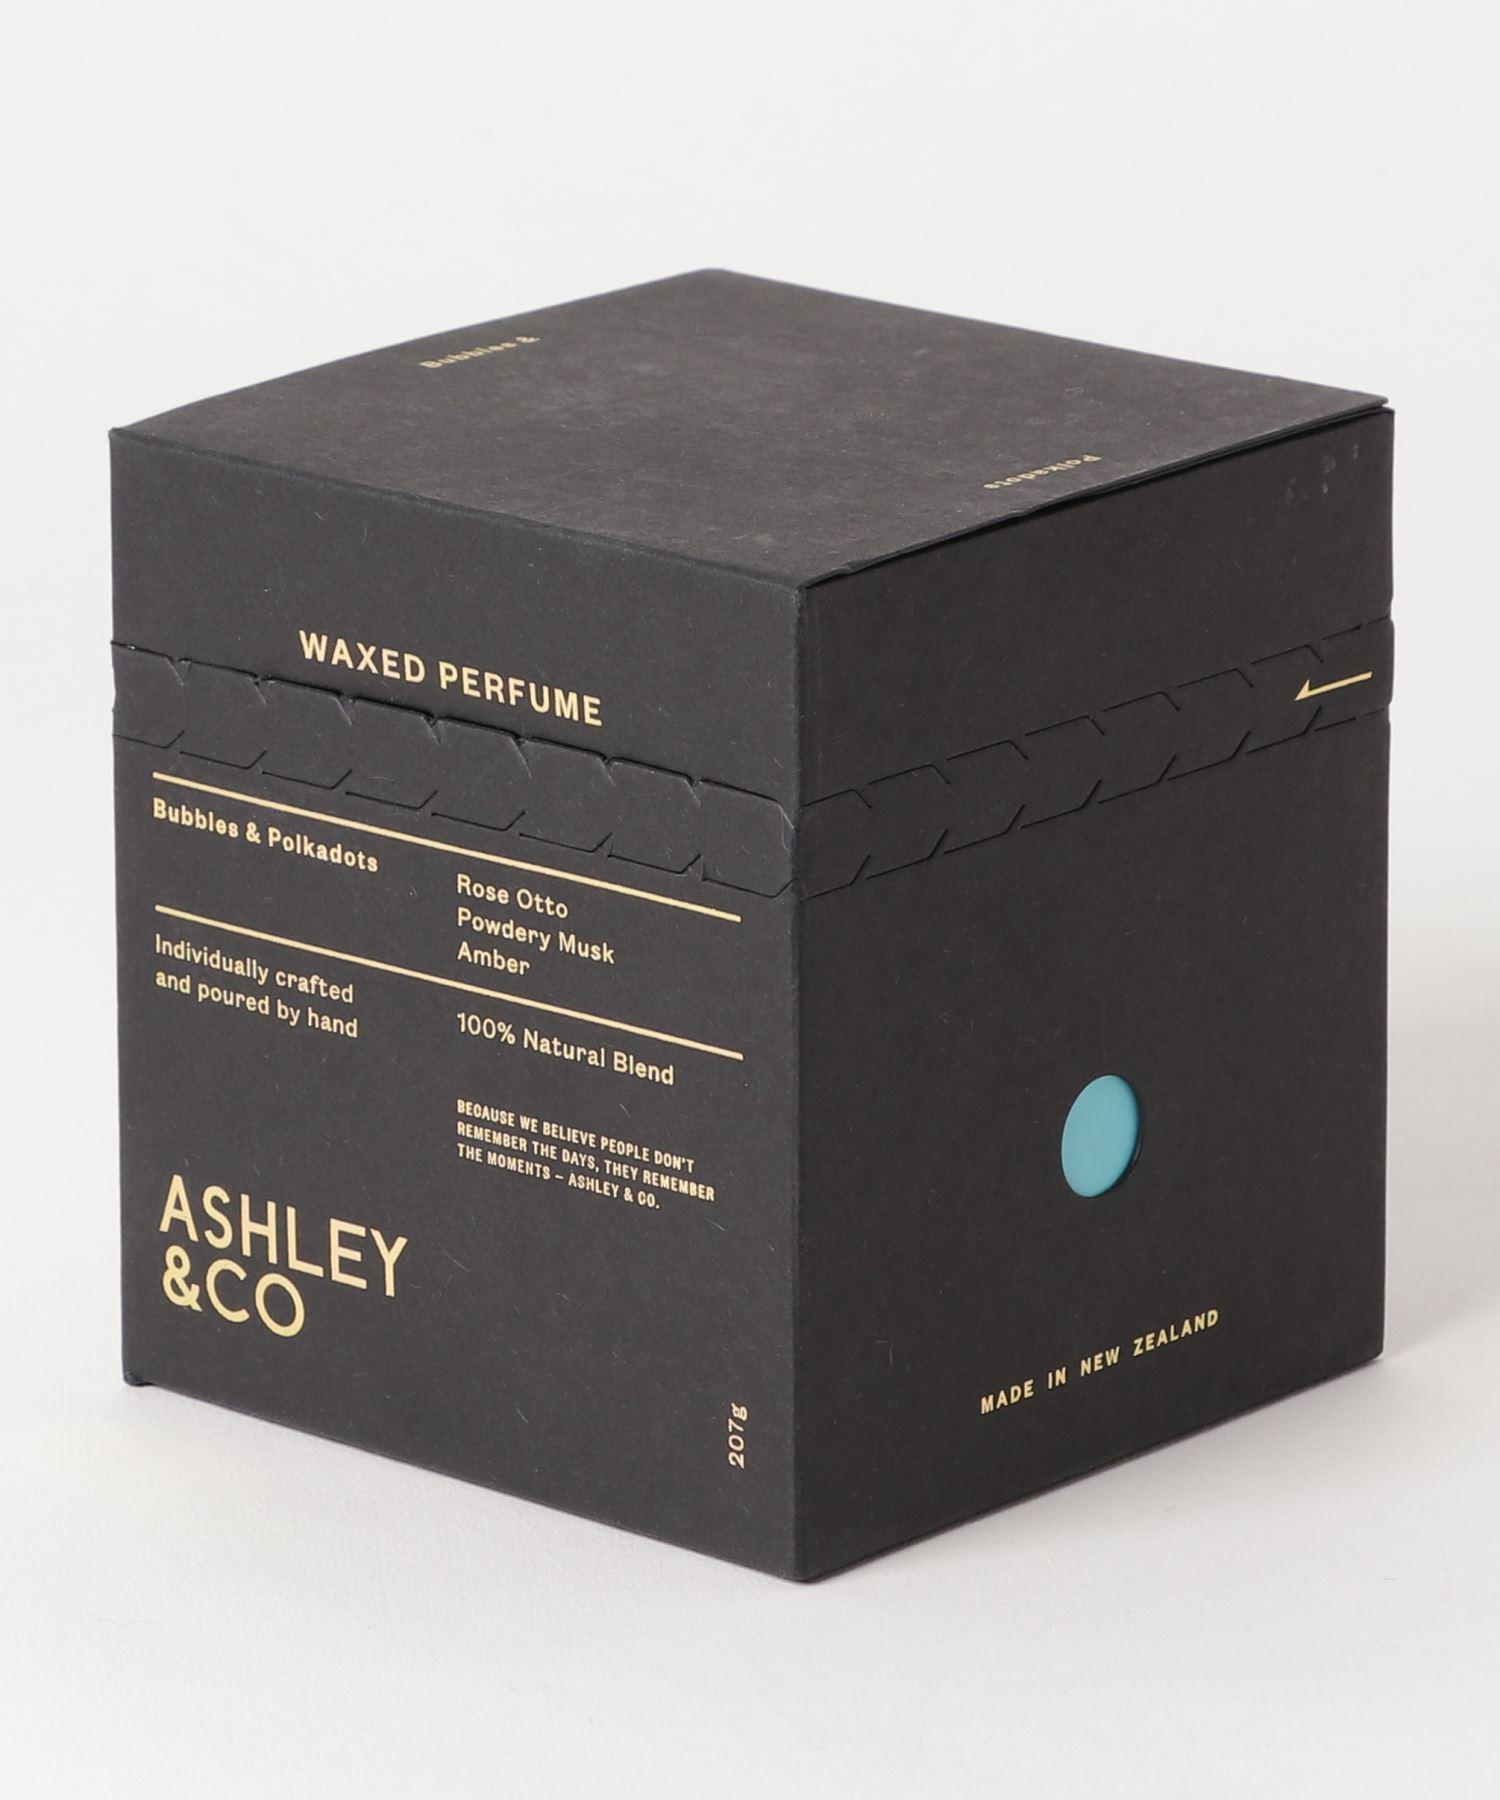 ASHLEY & CO アロマキャンドル Bubbles & Polkadots 207g